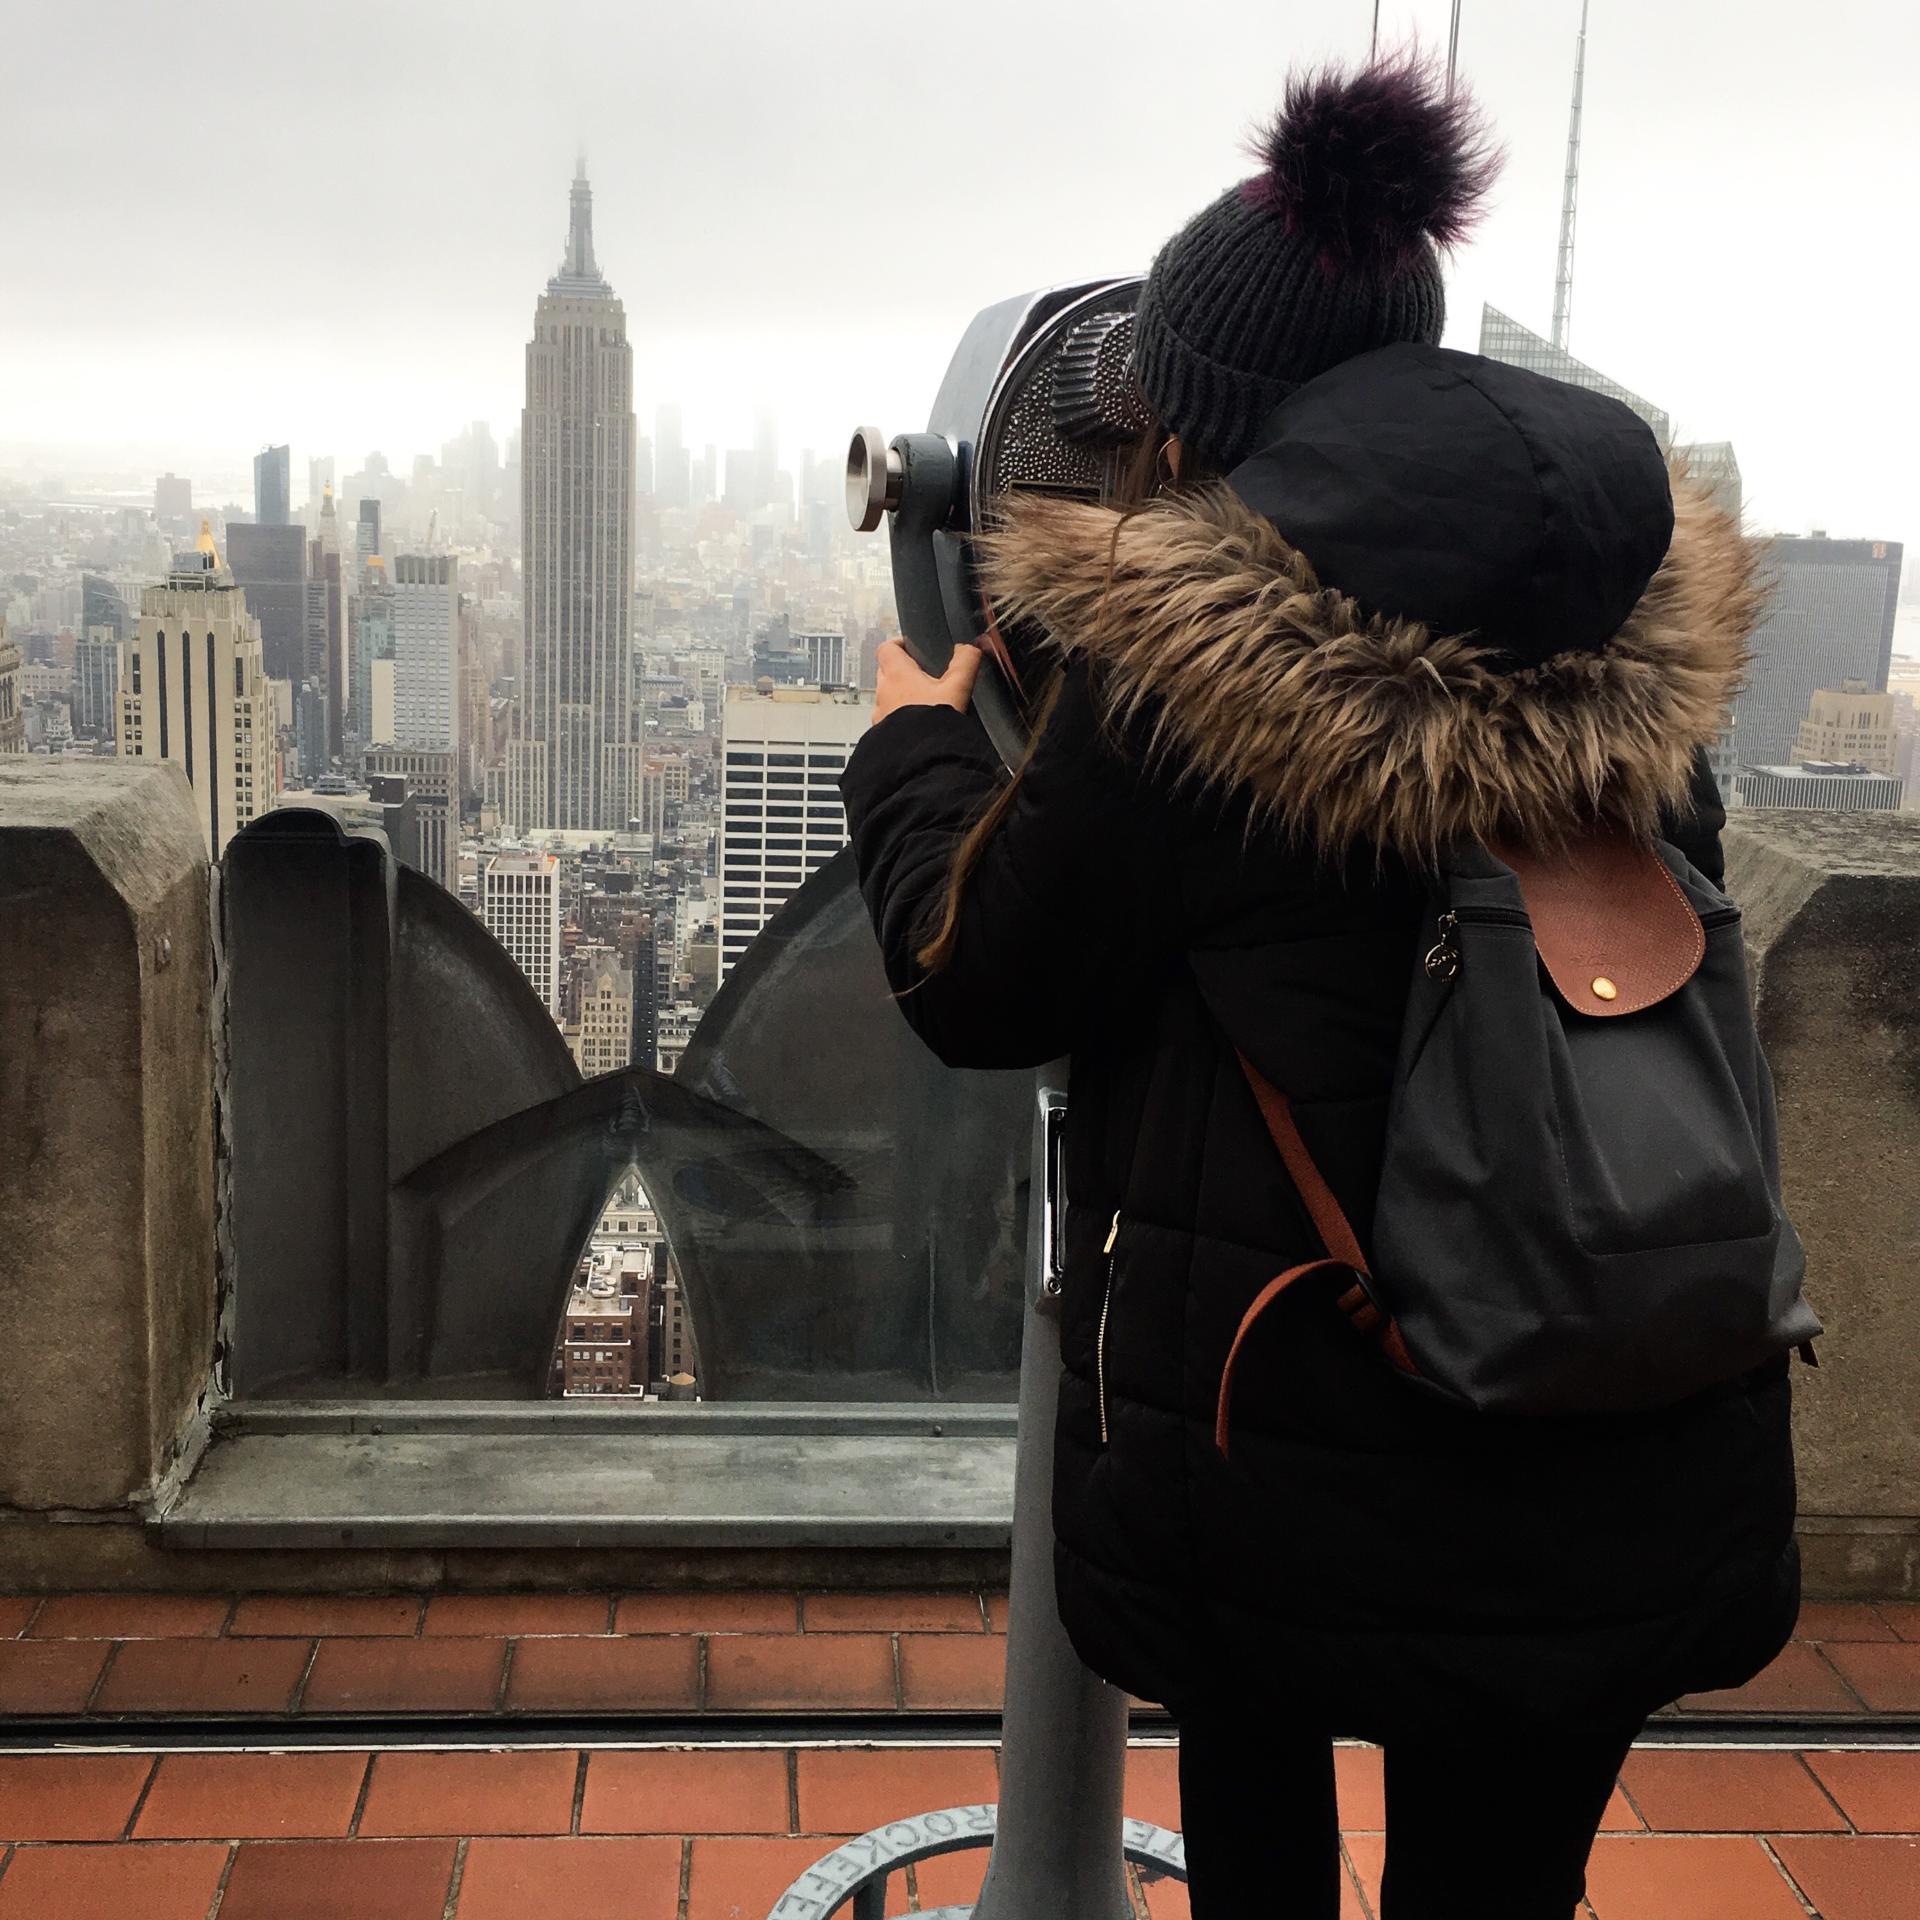 Five City Break Destination to Visit in 2019 with Jet2 - Rachel Nicole UK Travel Blogger